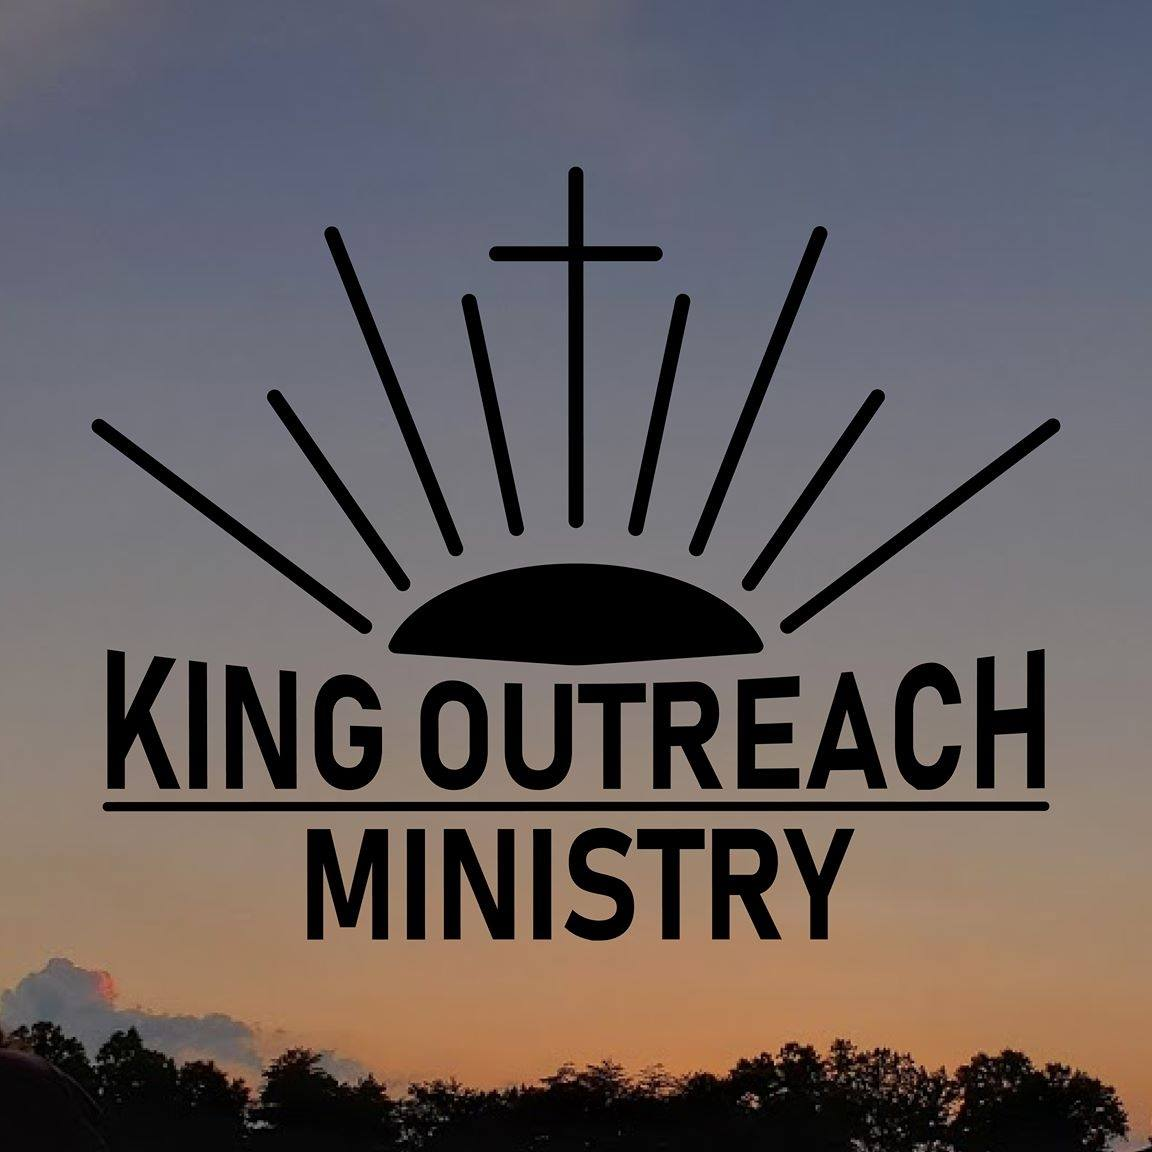 King Outreach